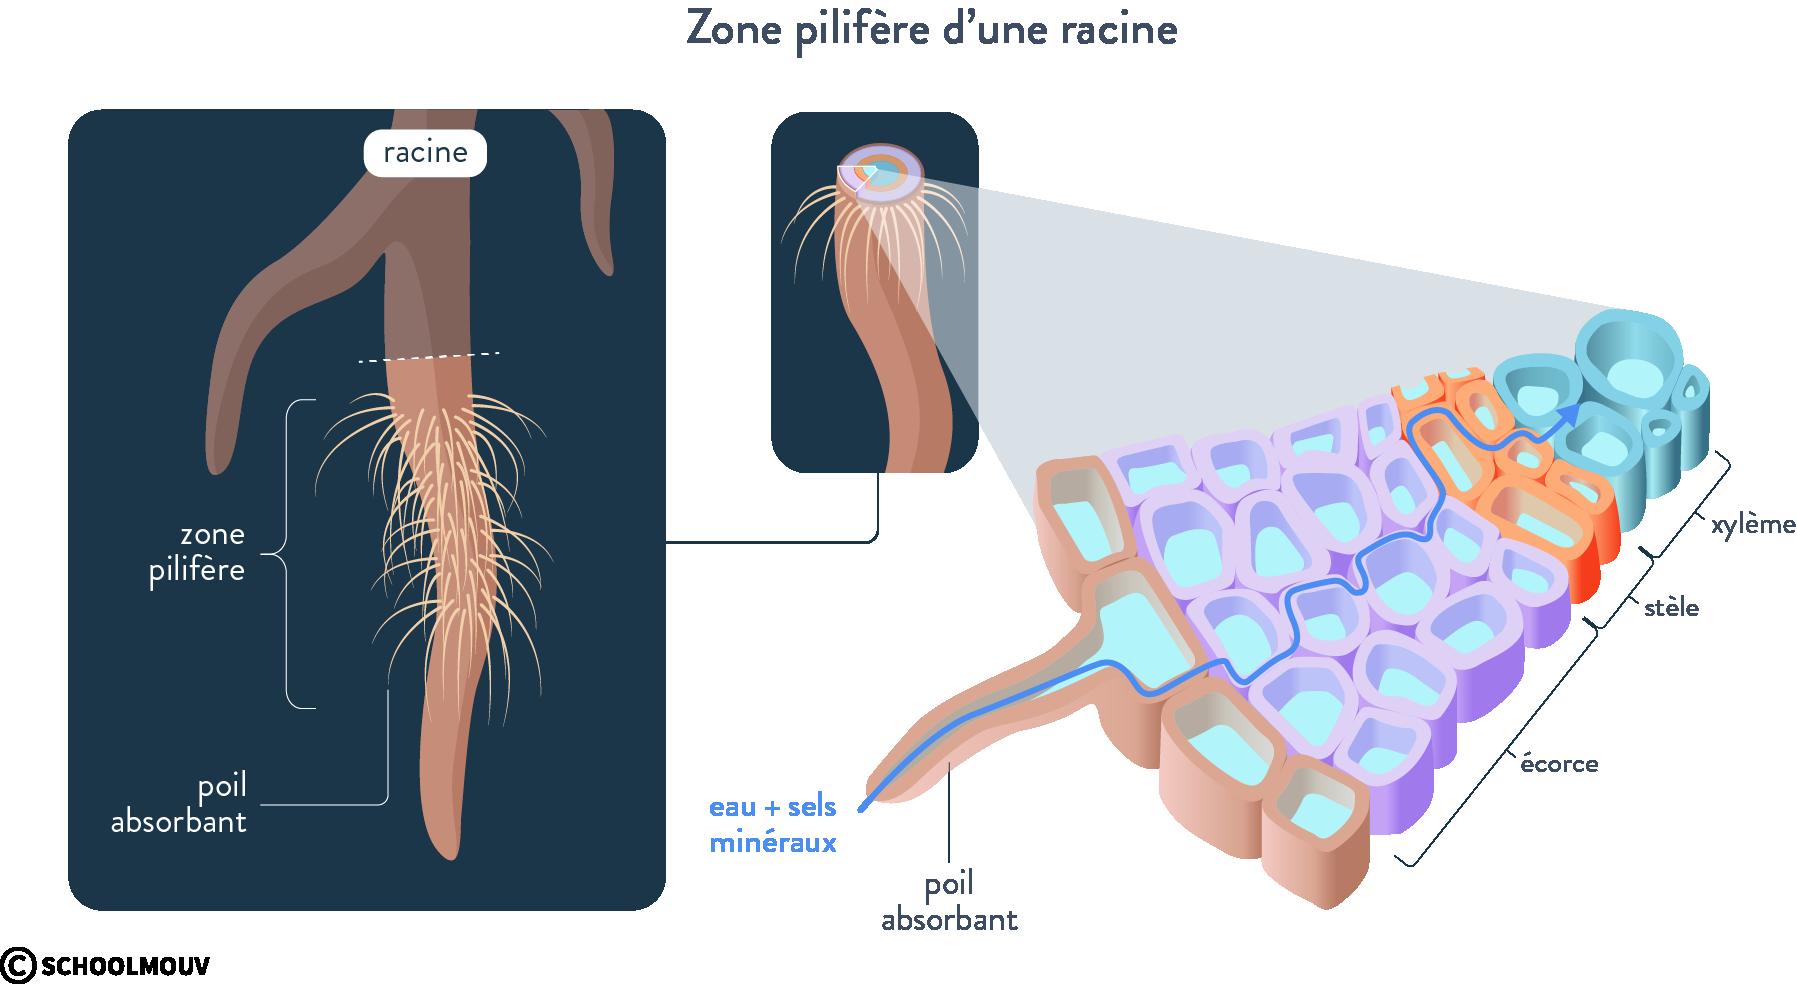 racine zone pilifère poil absorbant